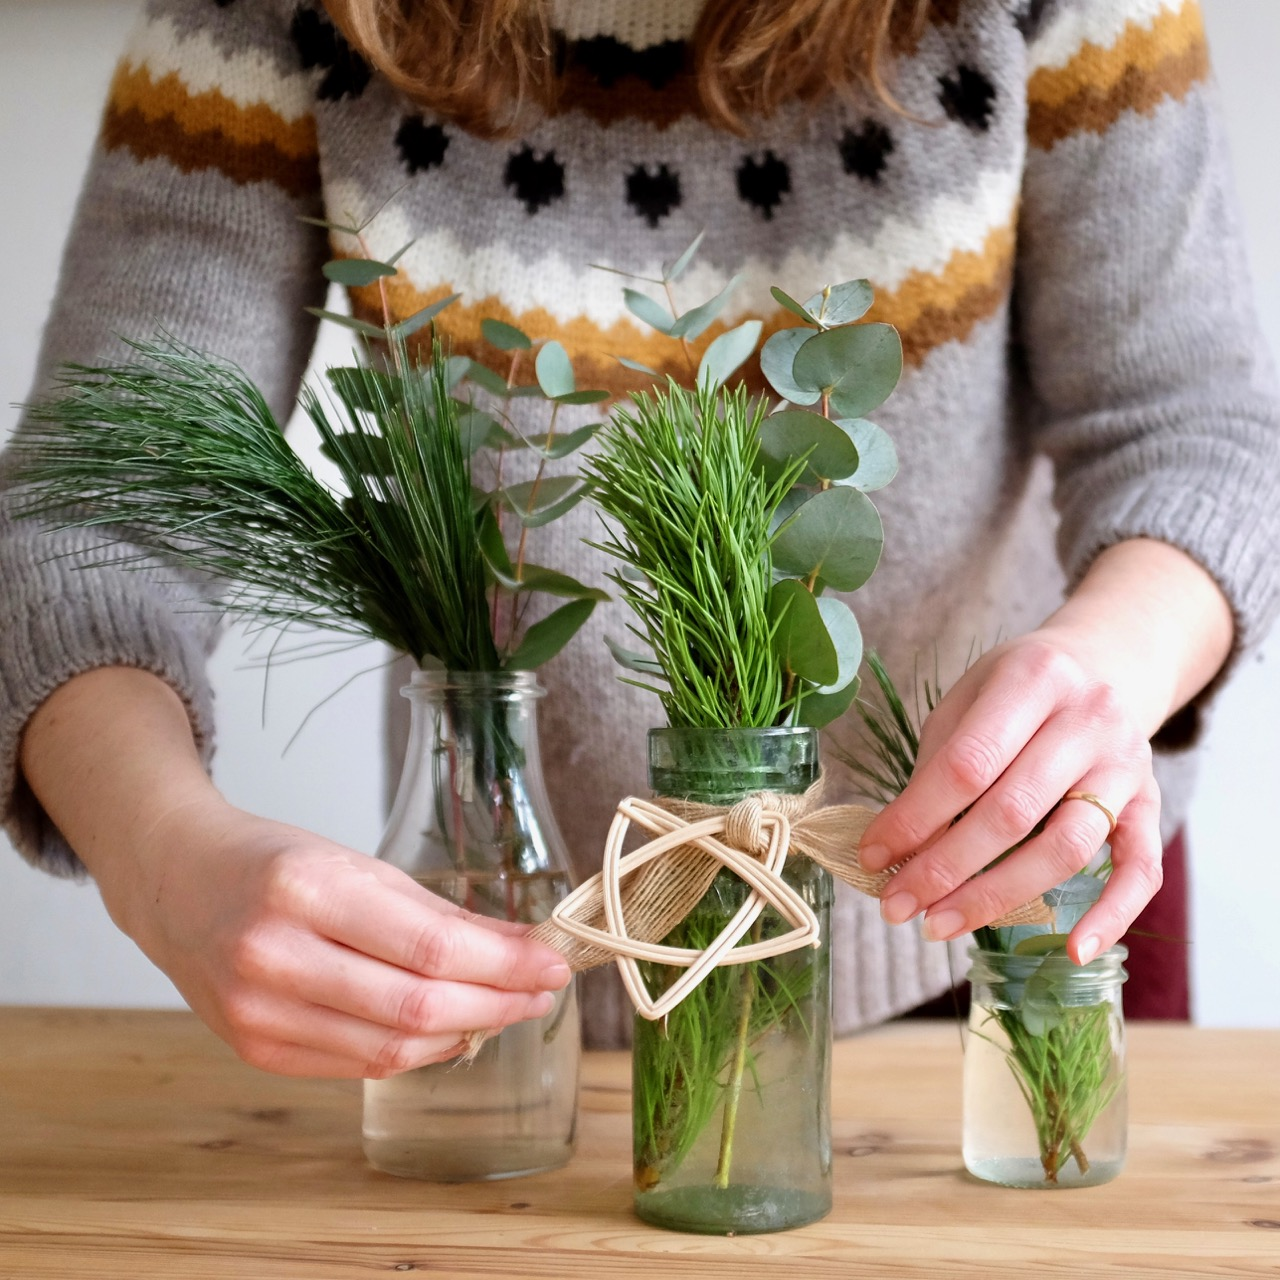 Gathering greenery for Christmas